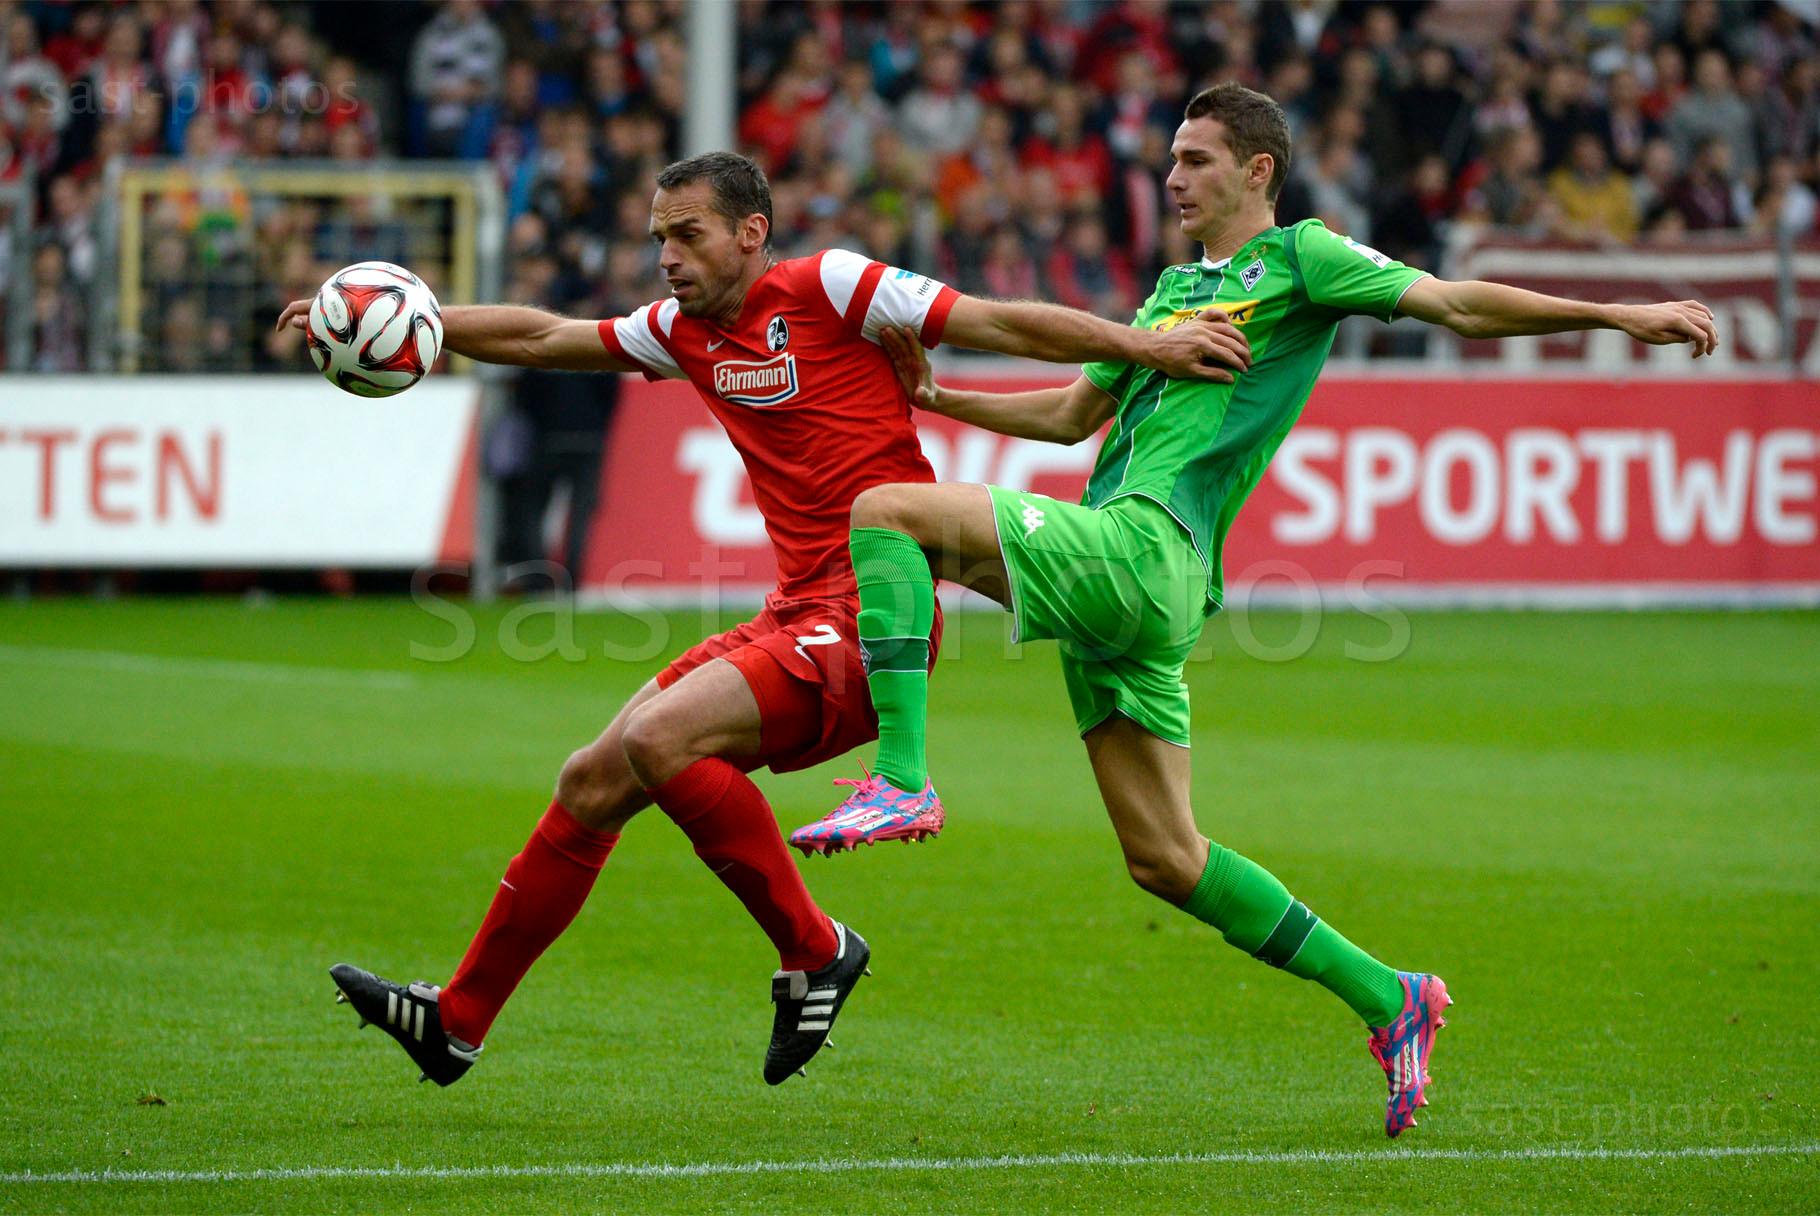 Pavel Krmas (L. Freiburg) gegen Branimir Hrgota (Gladbach)